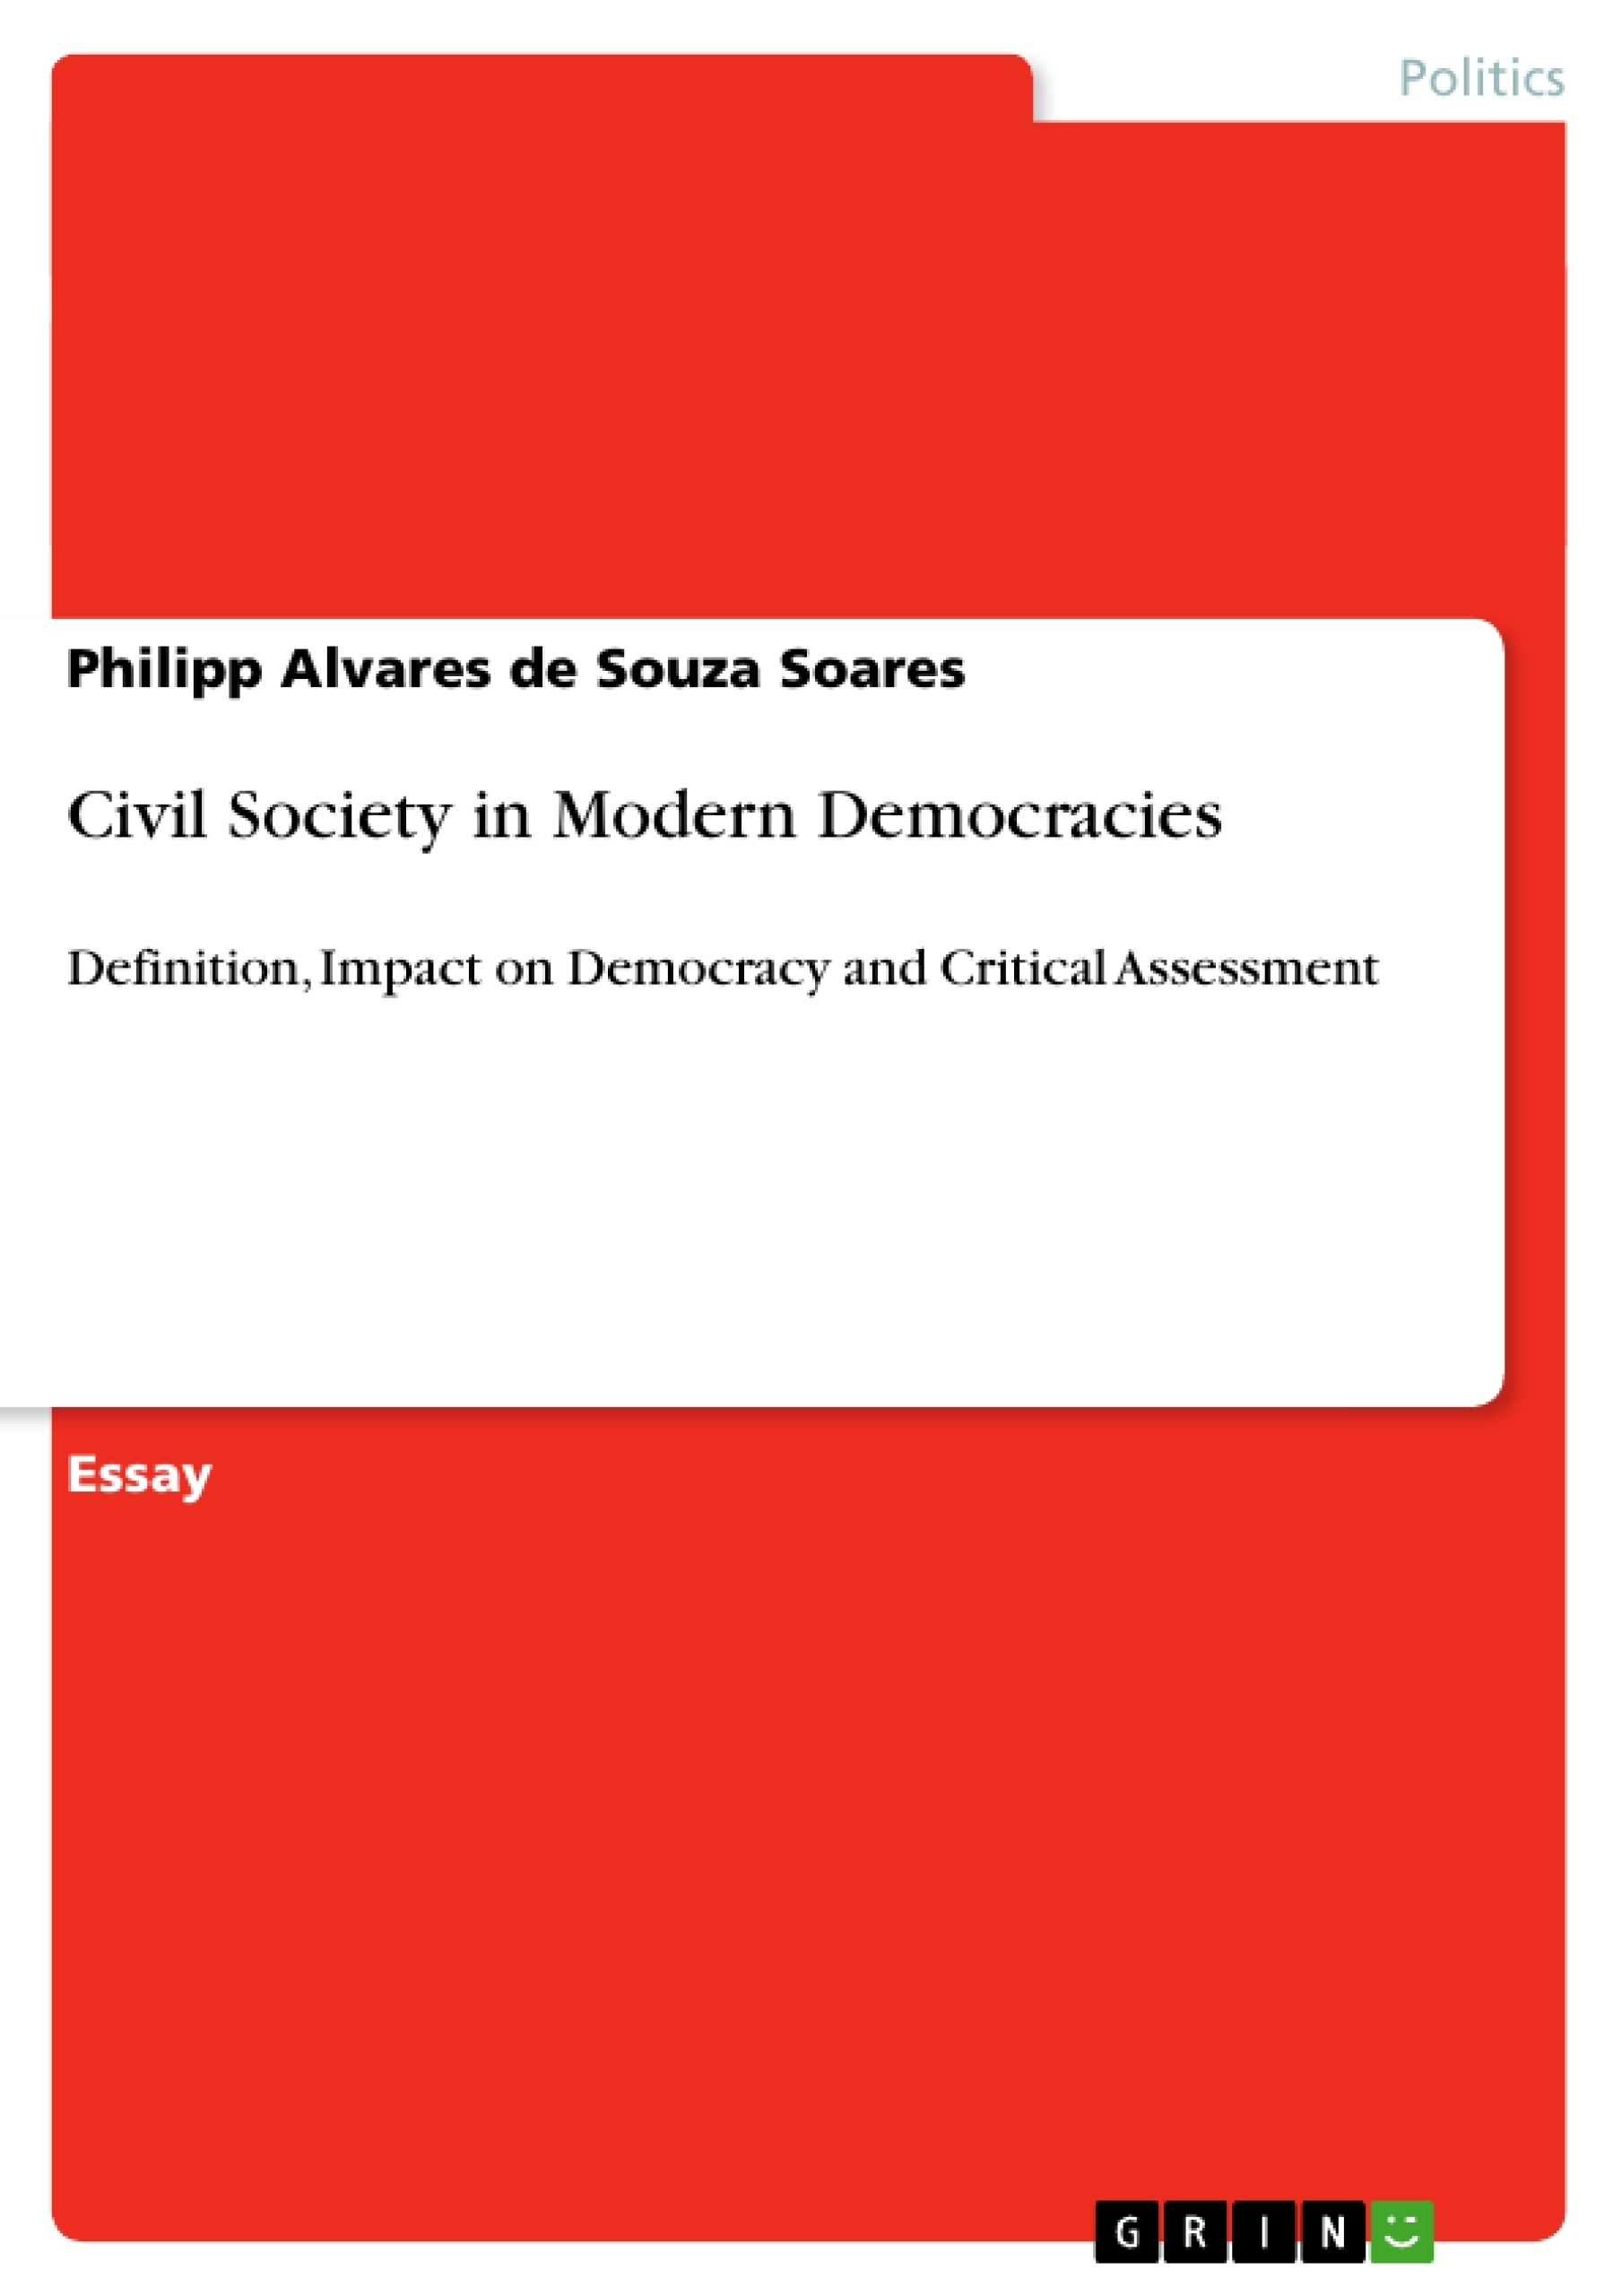 Title: Civil Society in Modern Democracies